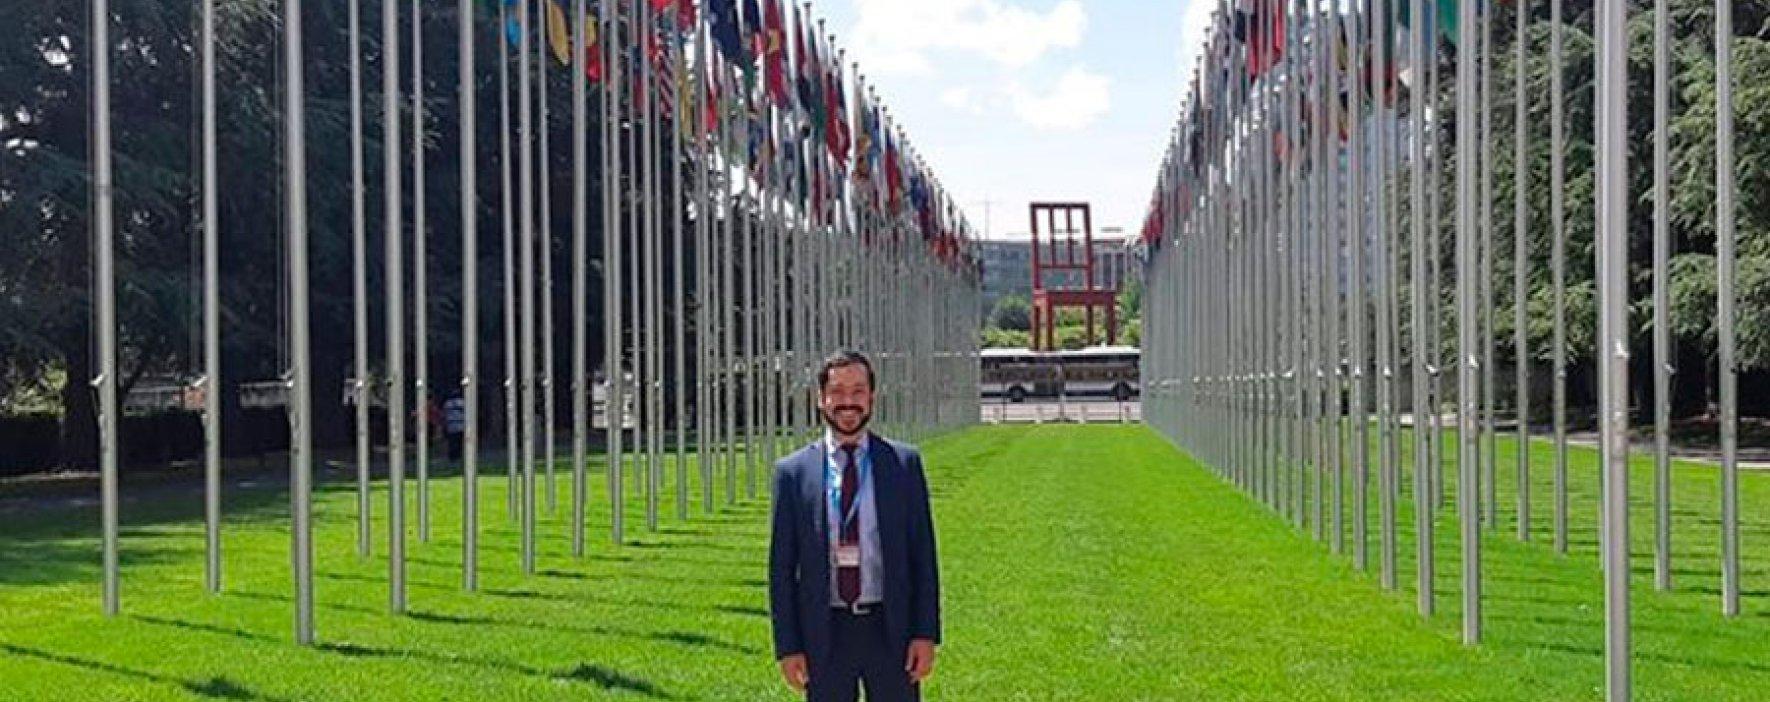 Jaime Matute Hernández, nuevo director ejecutivo de la AFE